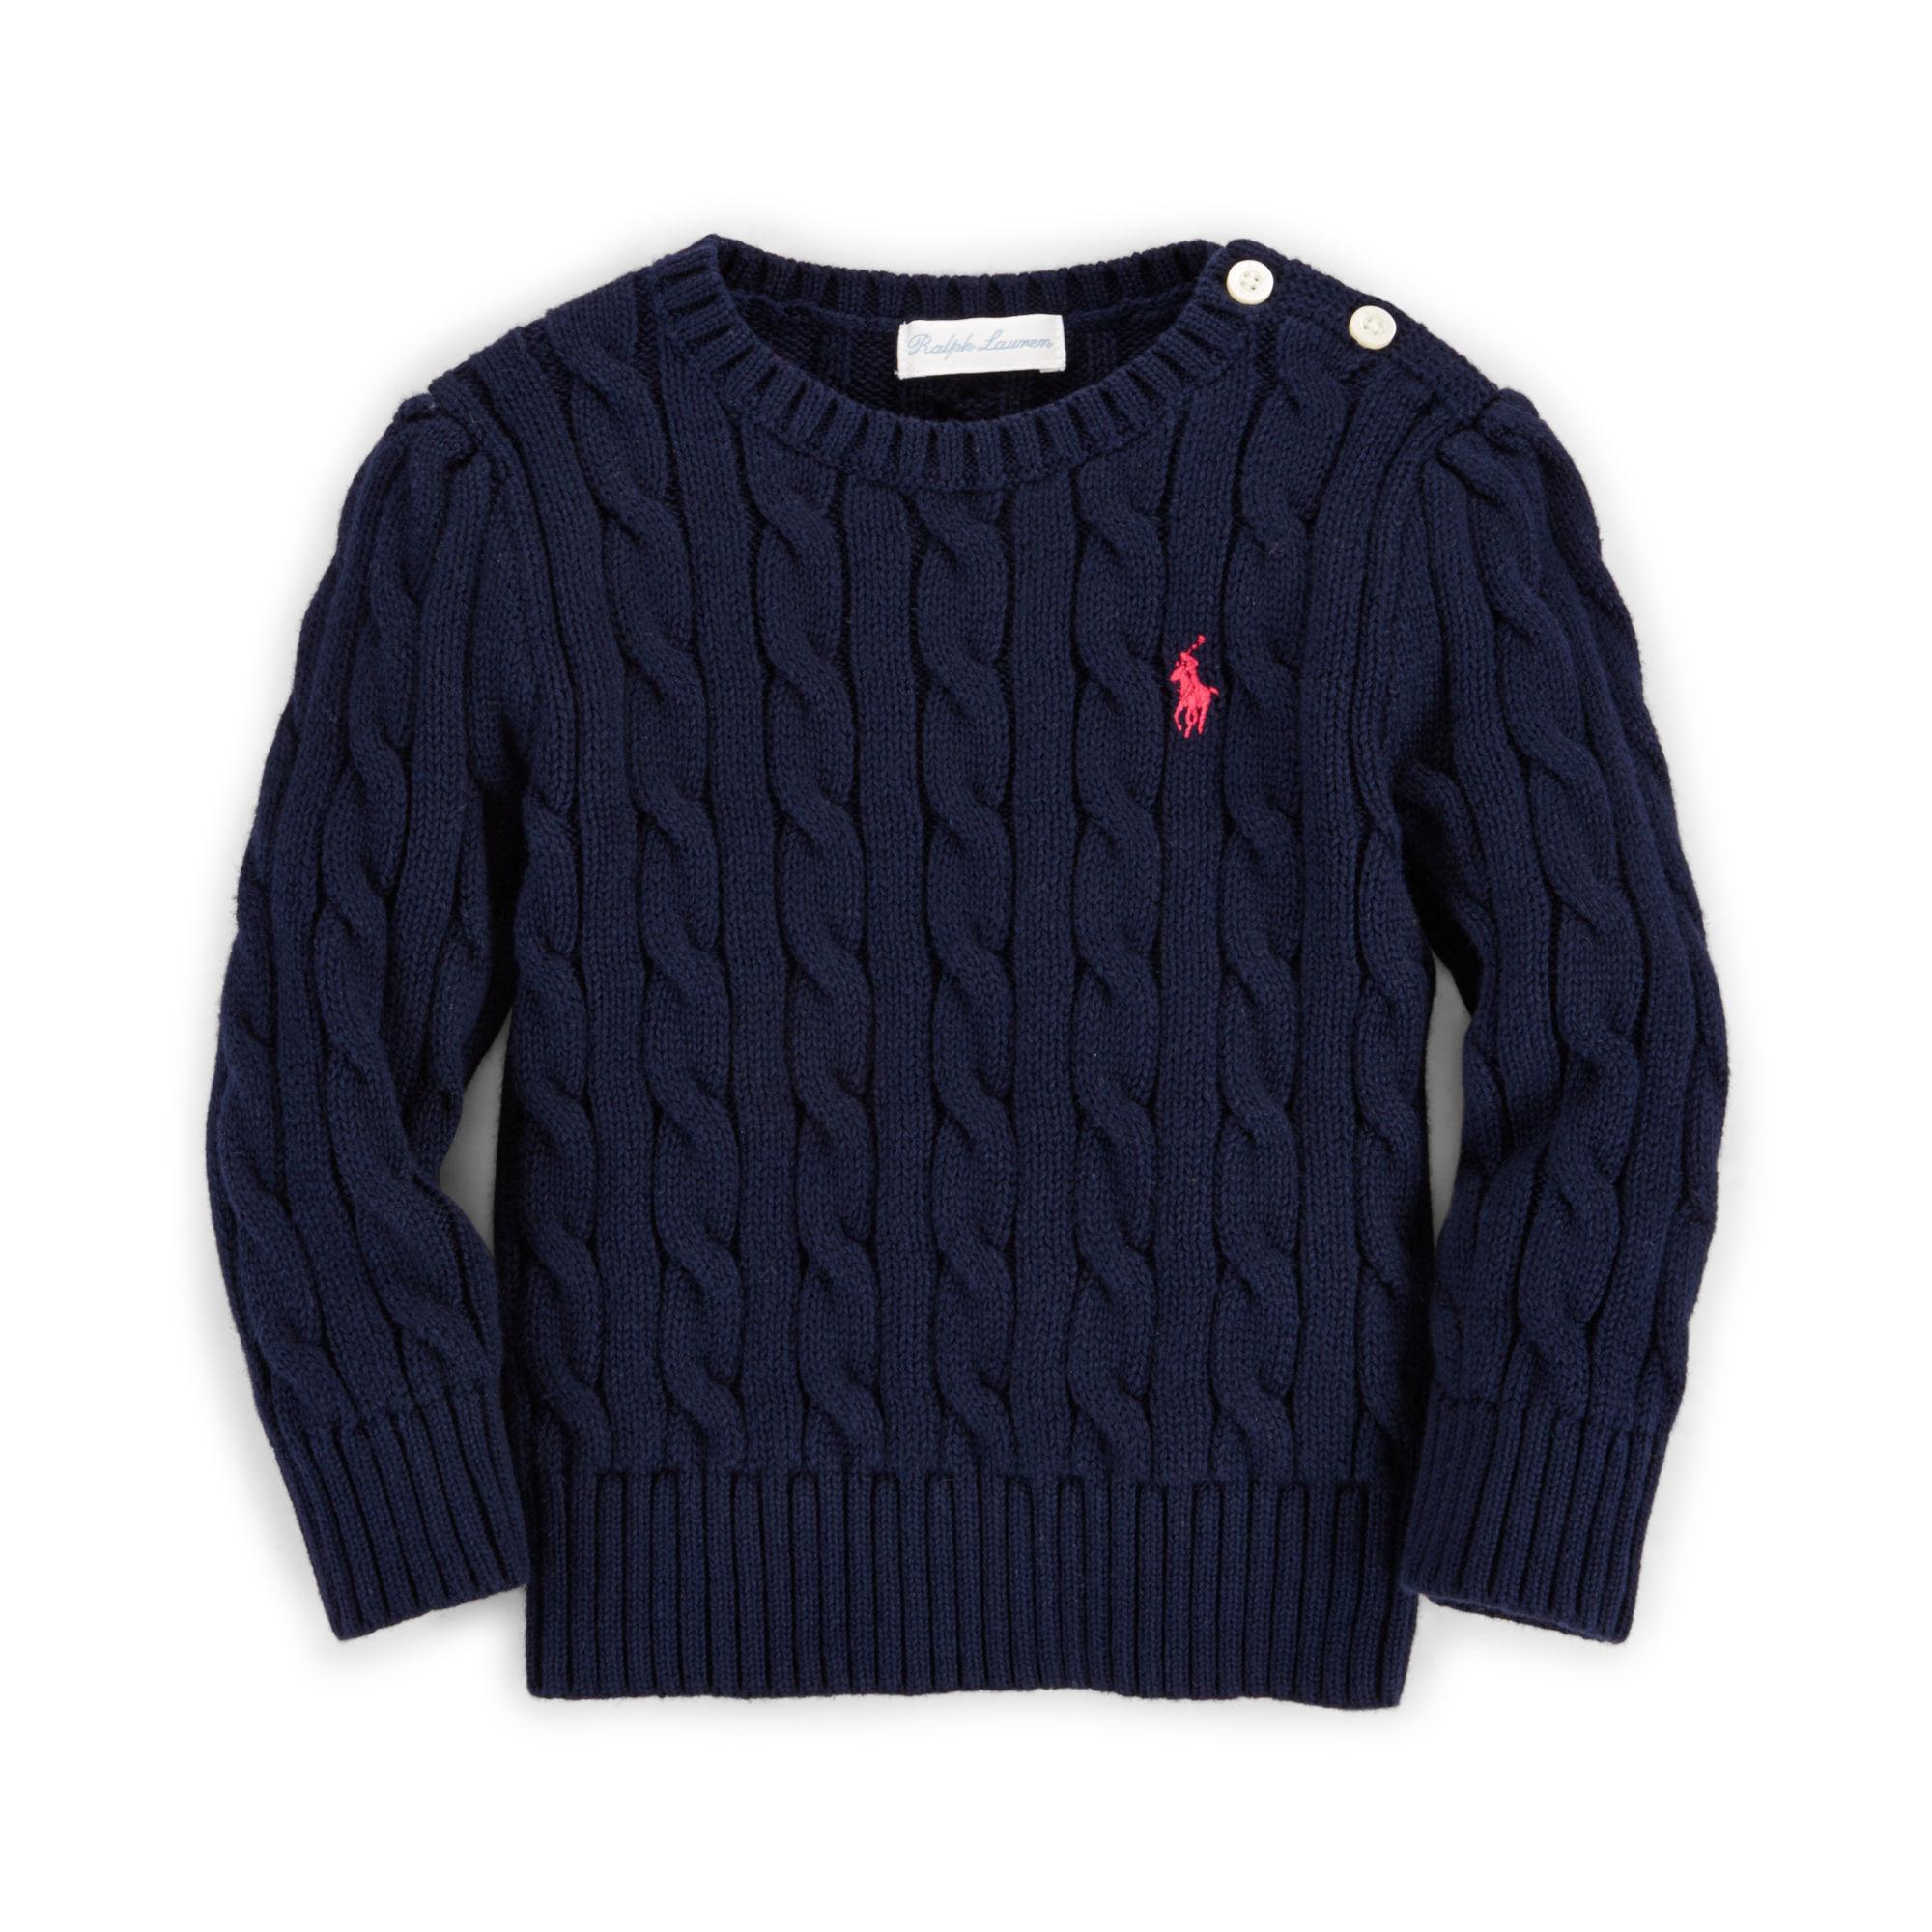 c1a481d23 Ralph Lauren Cable-knit Cotton Sweater in Blue - Lyst